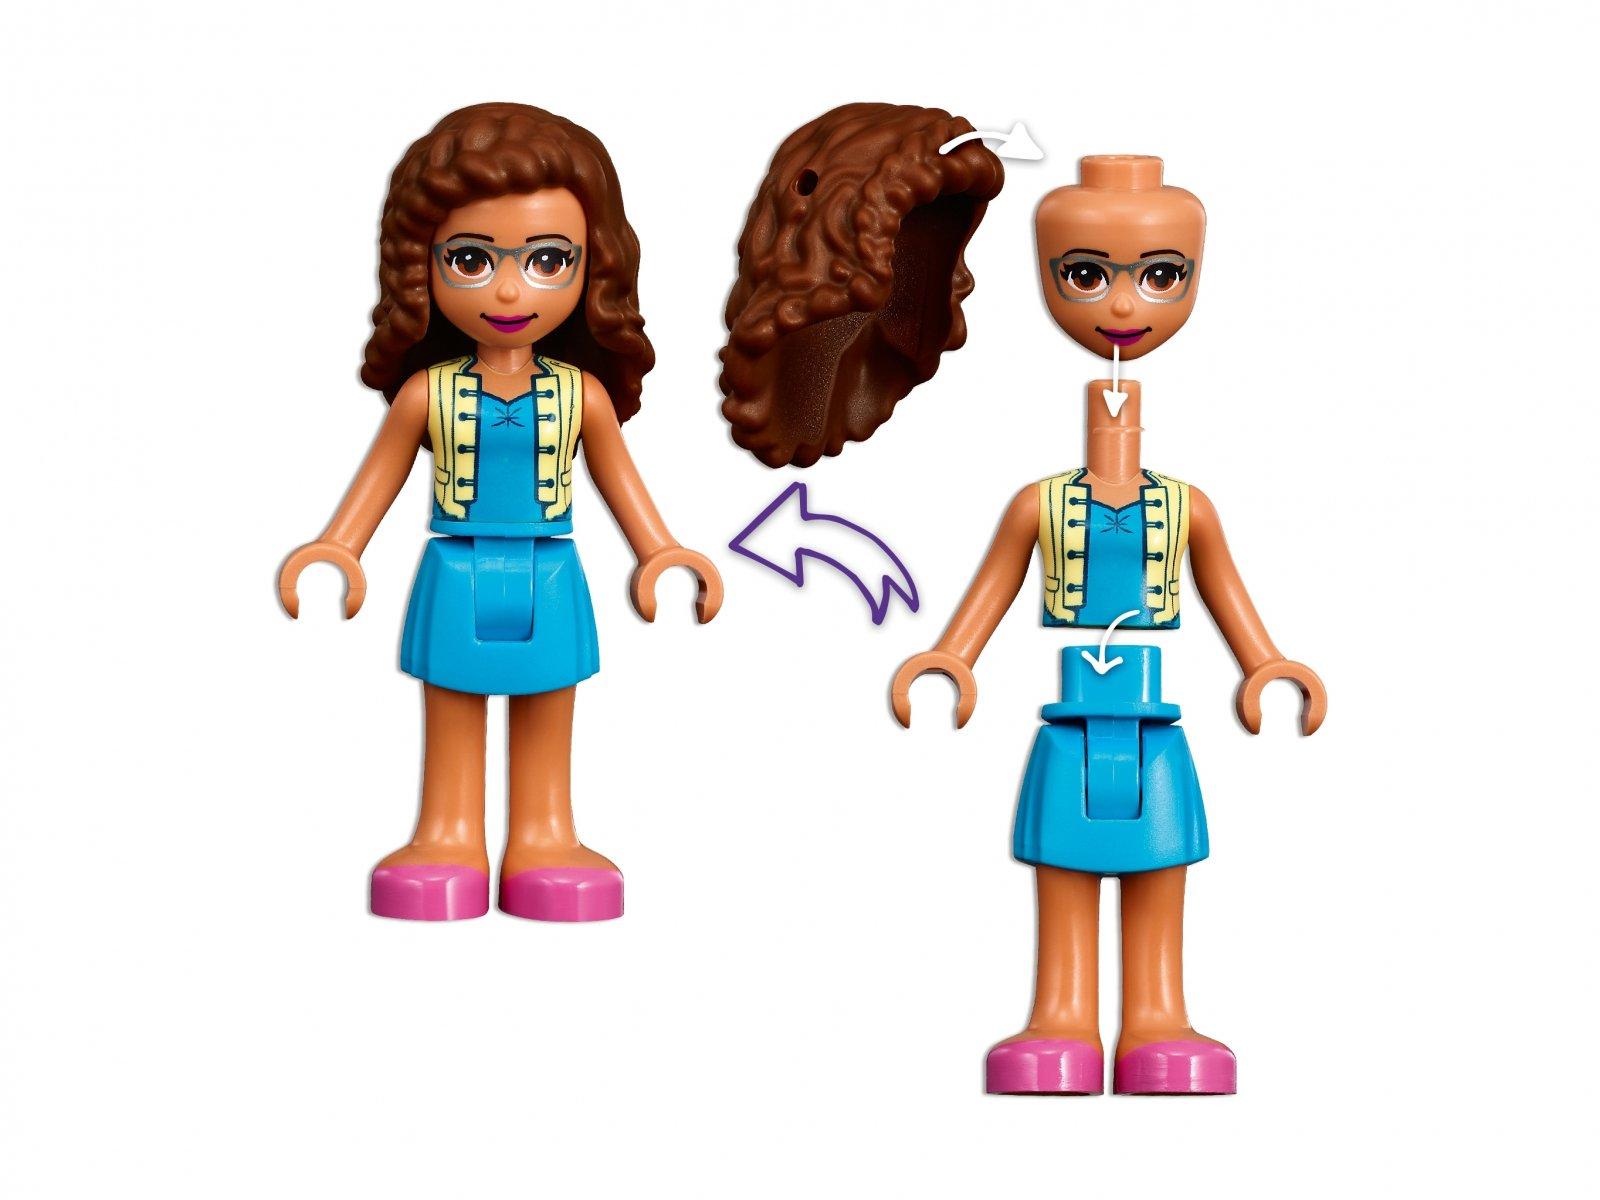 LEGO 41447 Friends Park w Heartlake City